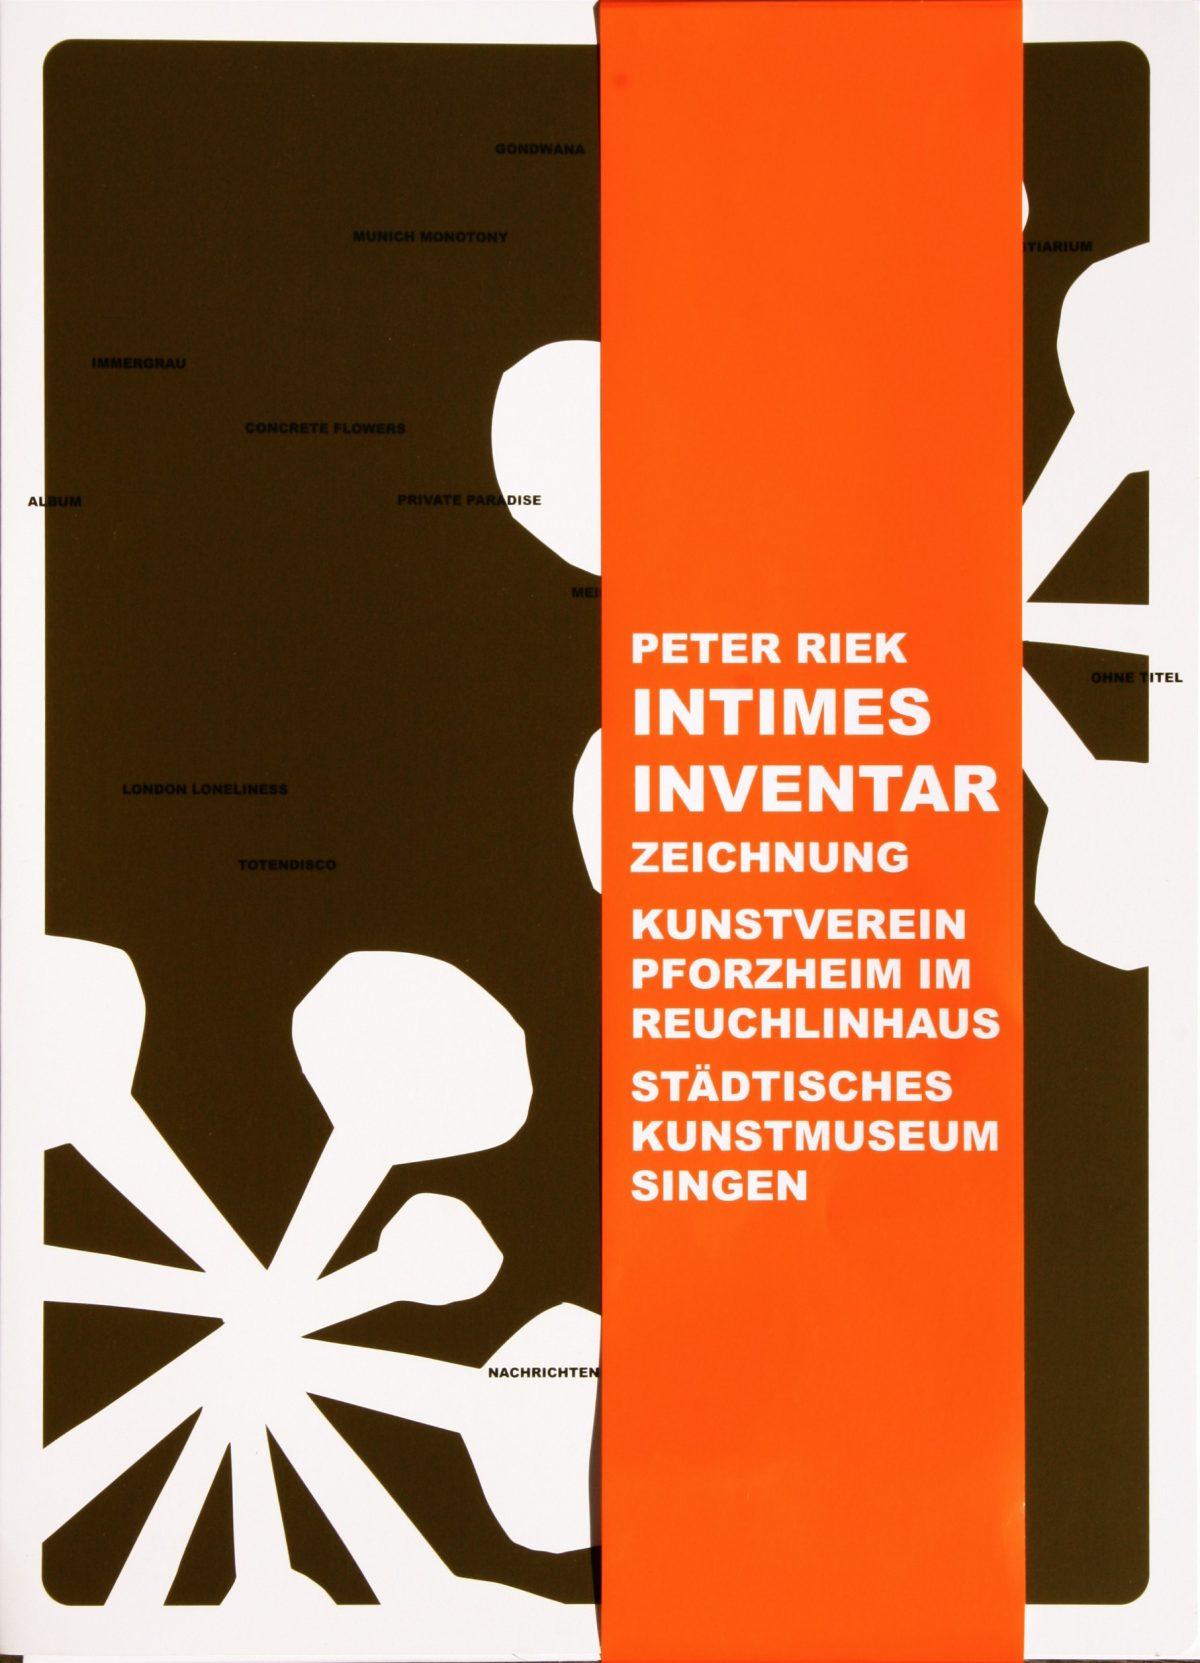 PETER RIEK Intimes Inventar